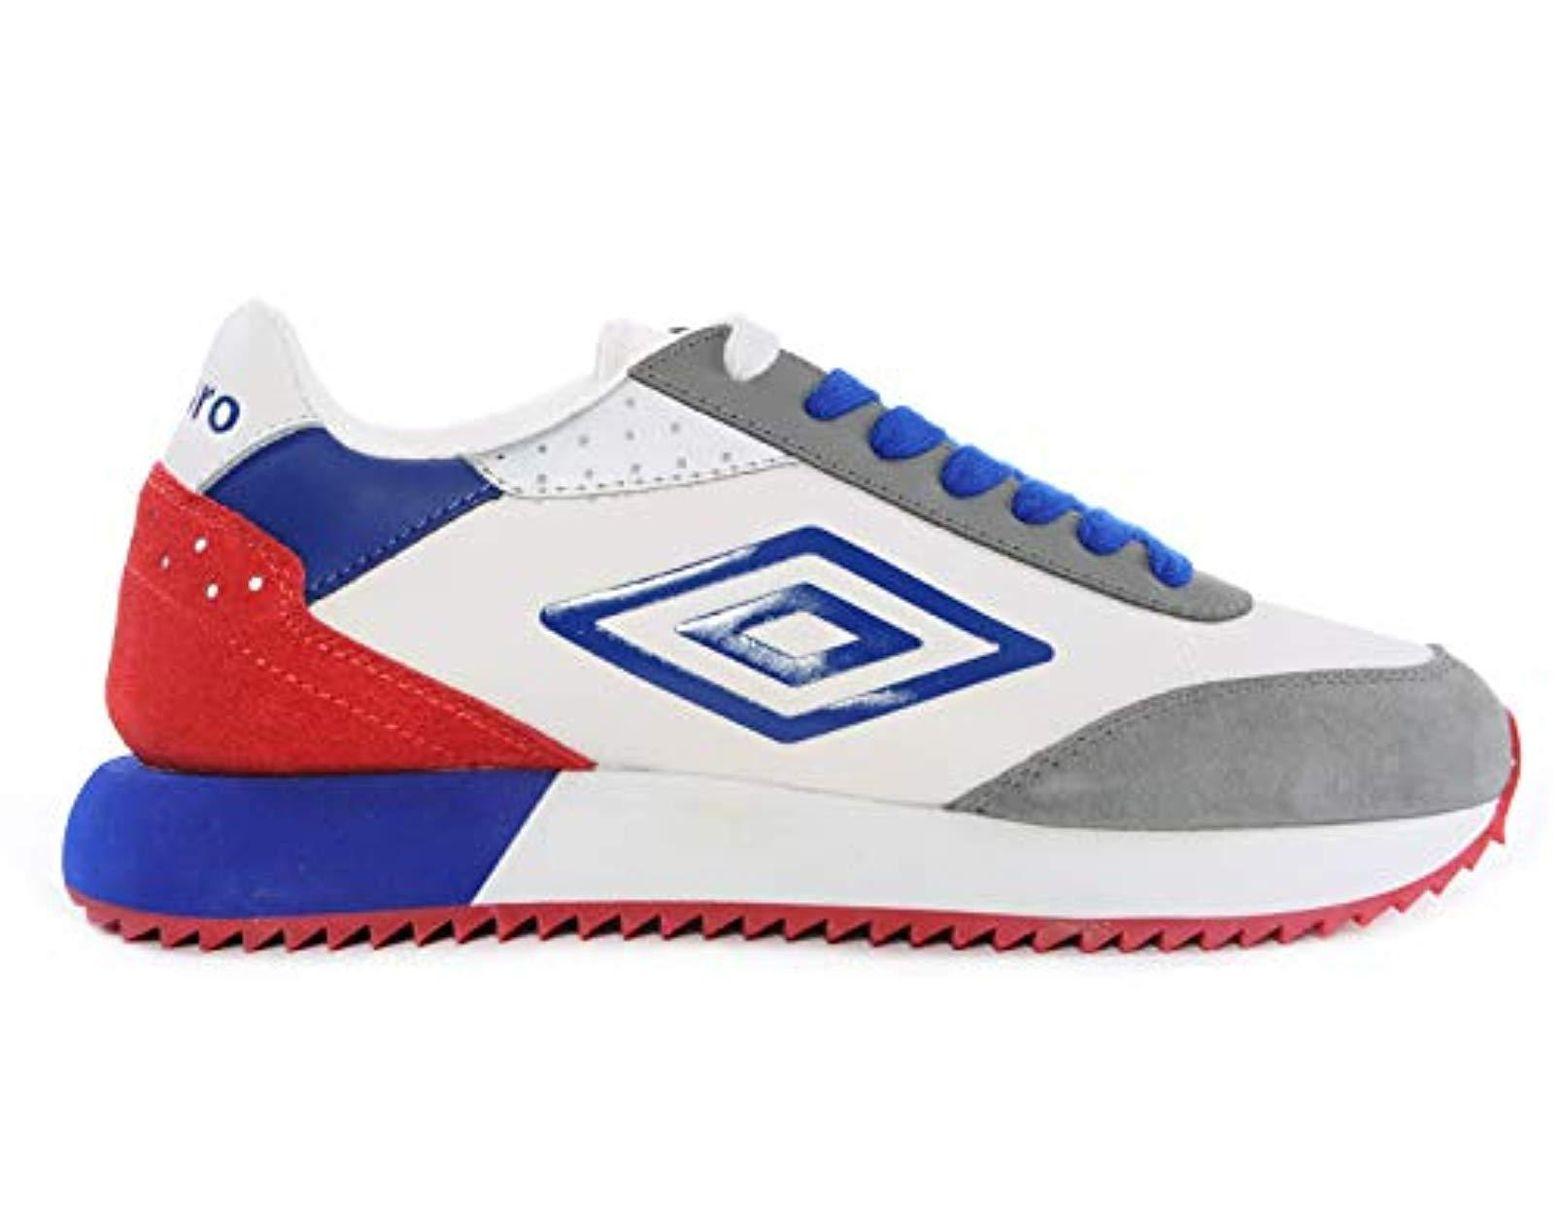 Umbro Sneakers Donna 36 Bianco/rosso/blu U191912m-w ...